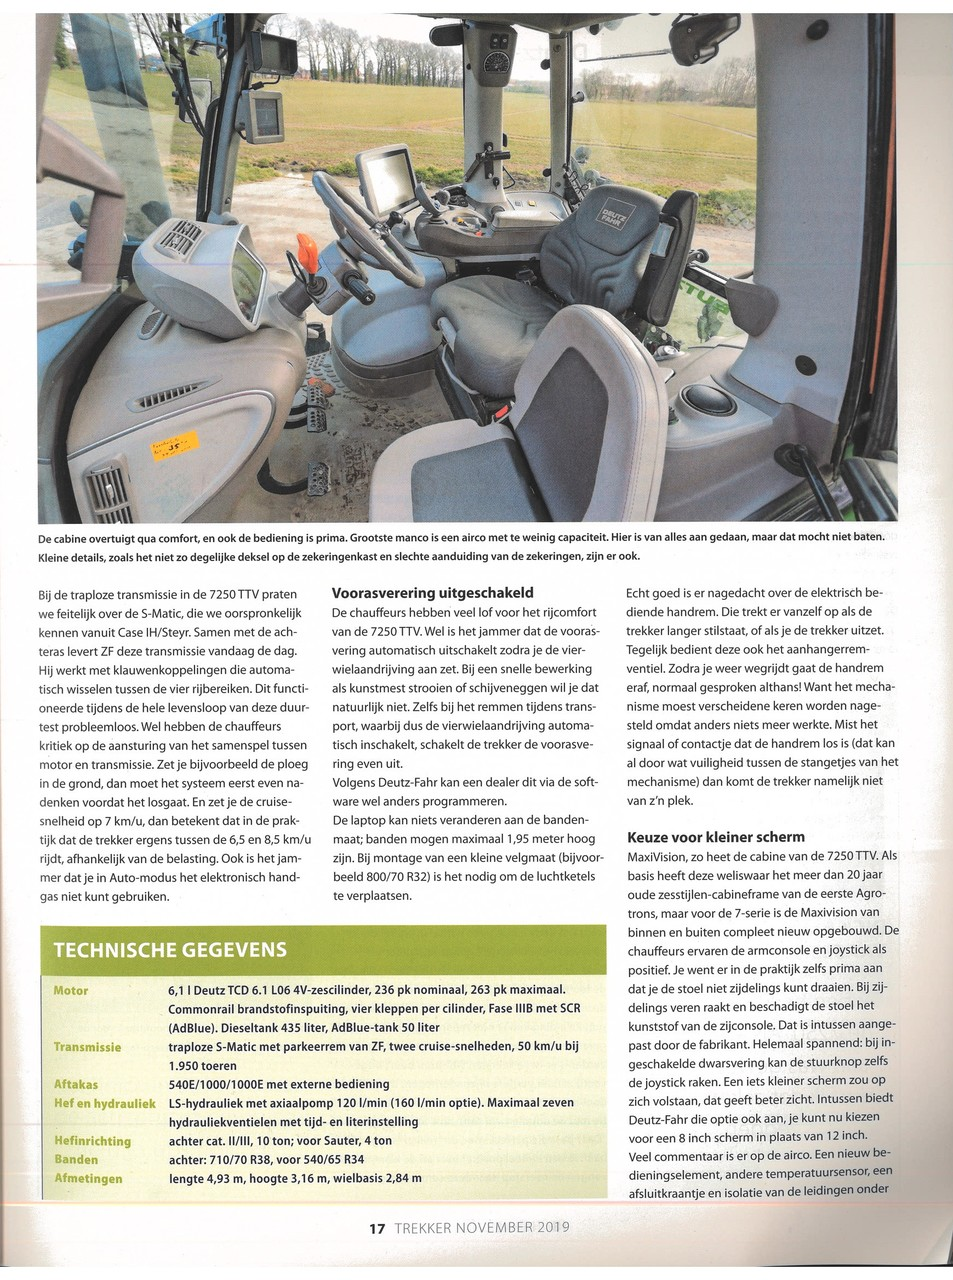 Deutz-Fahr 7250 TTV / Prima basis, mindere details